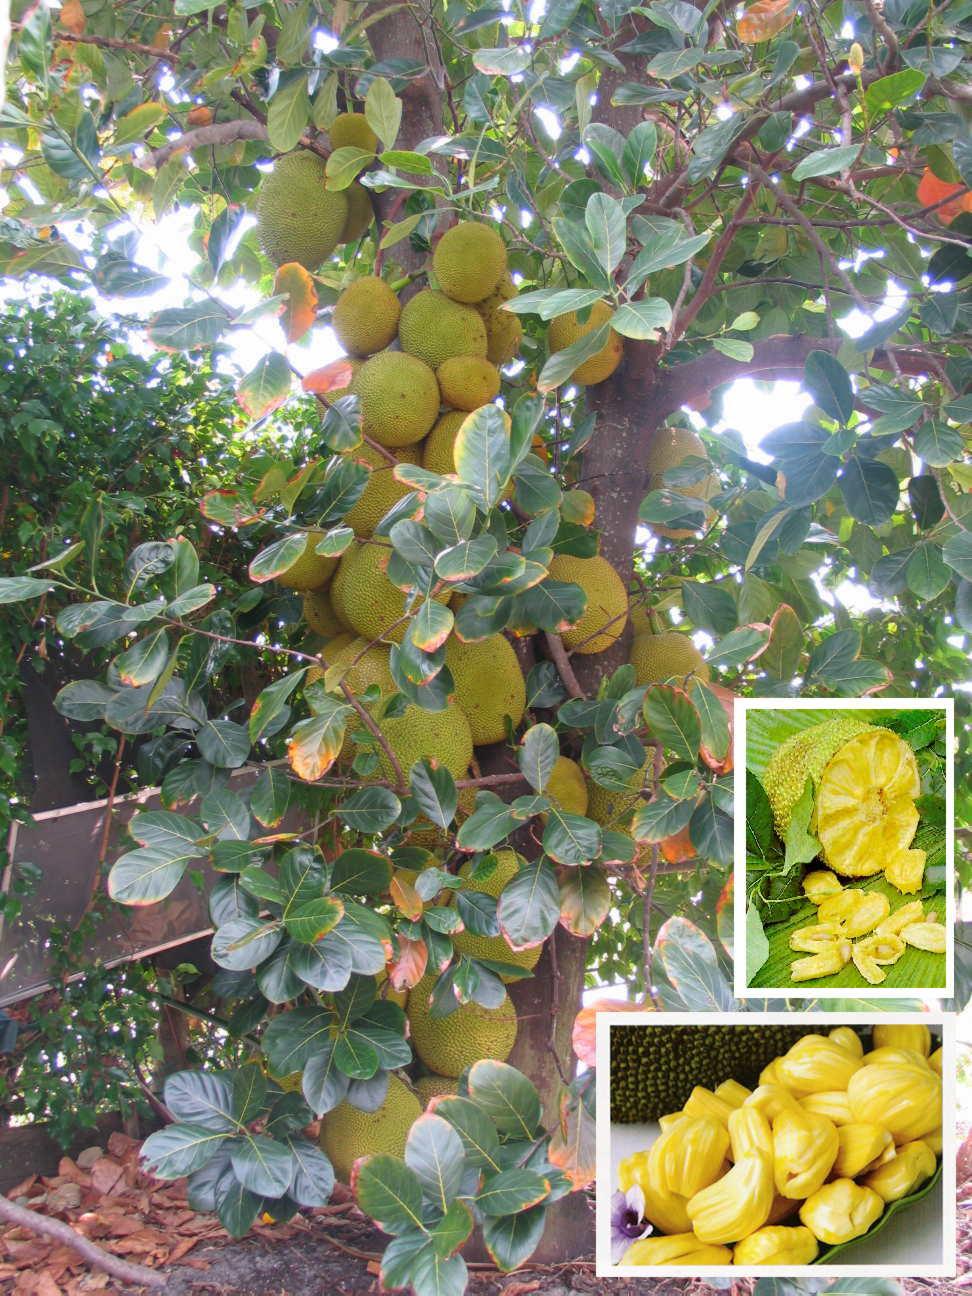 Jackfruit, again